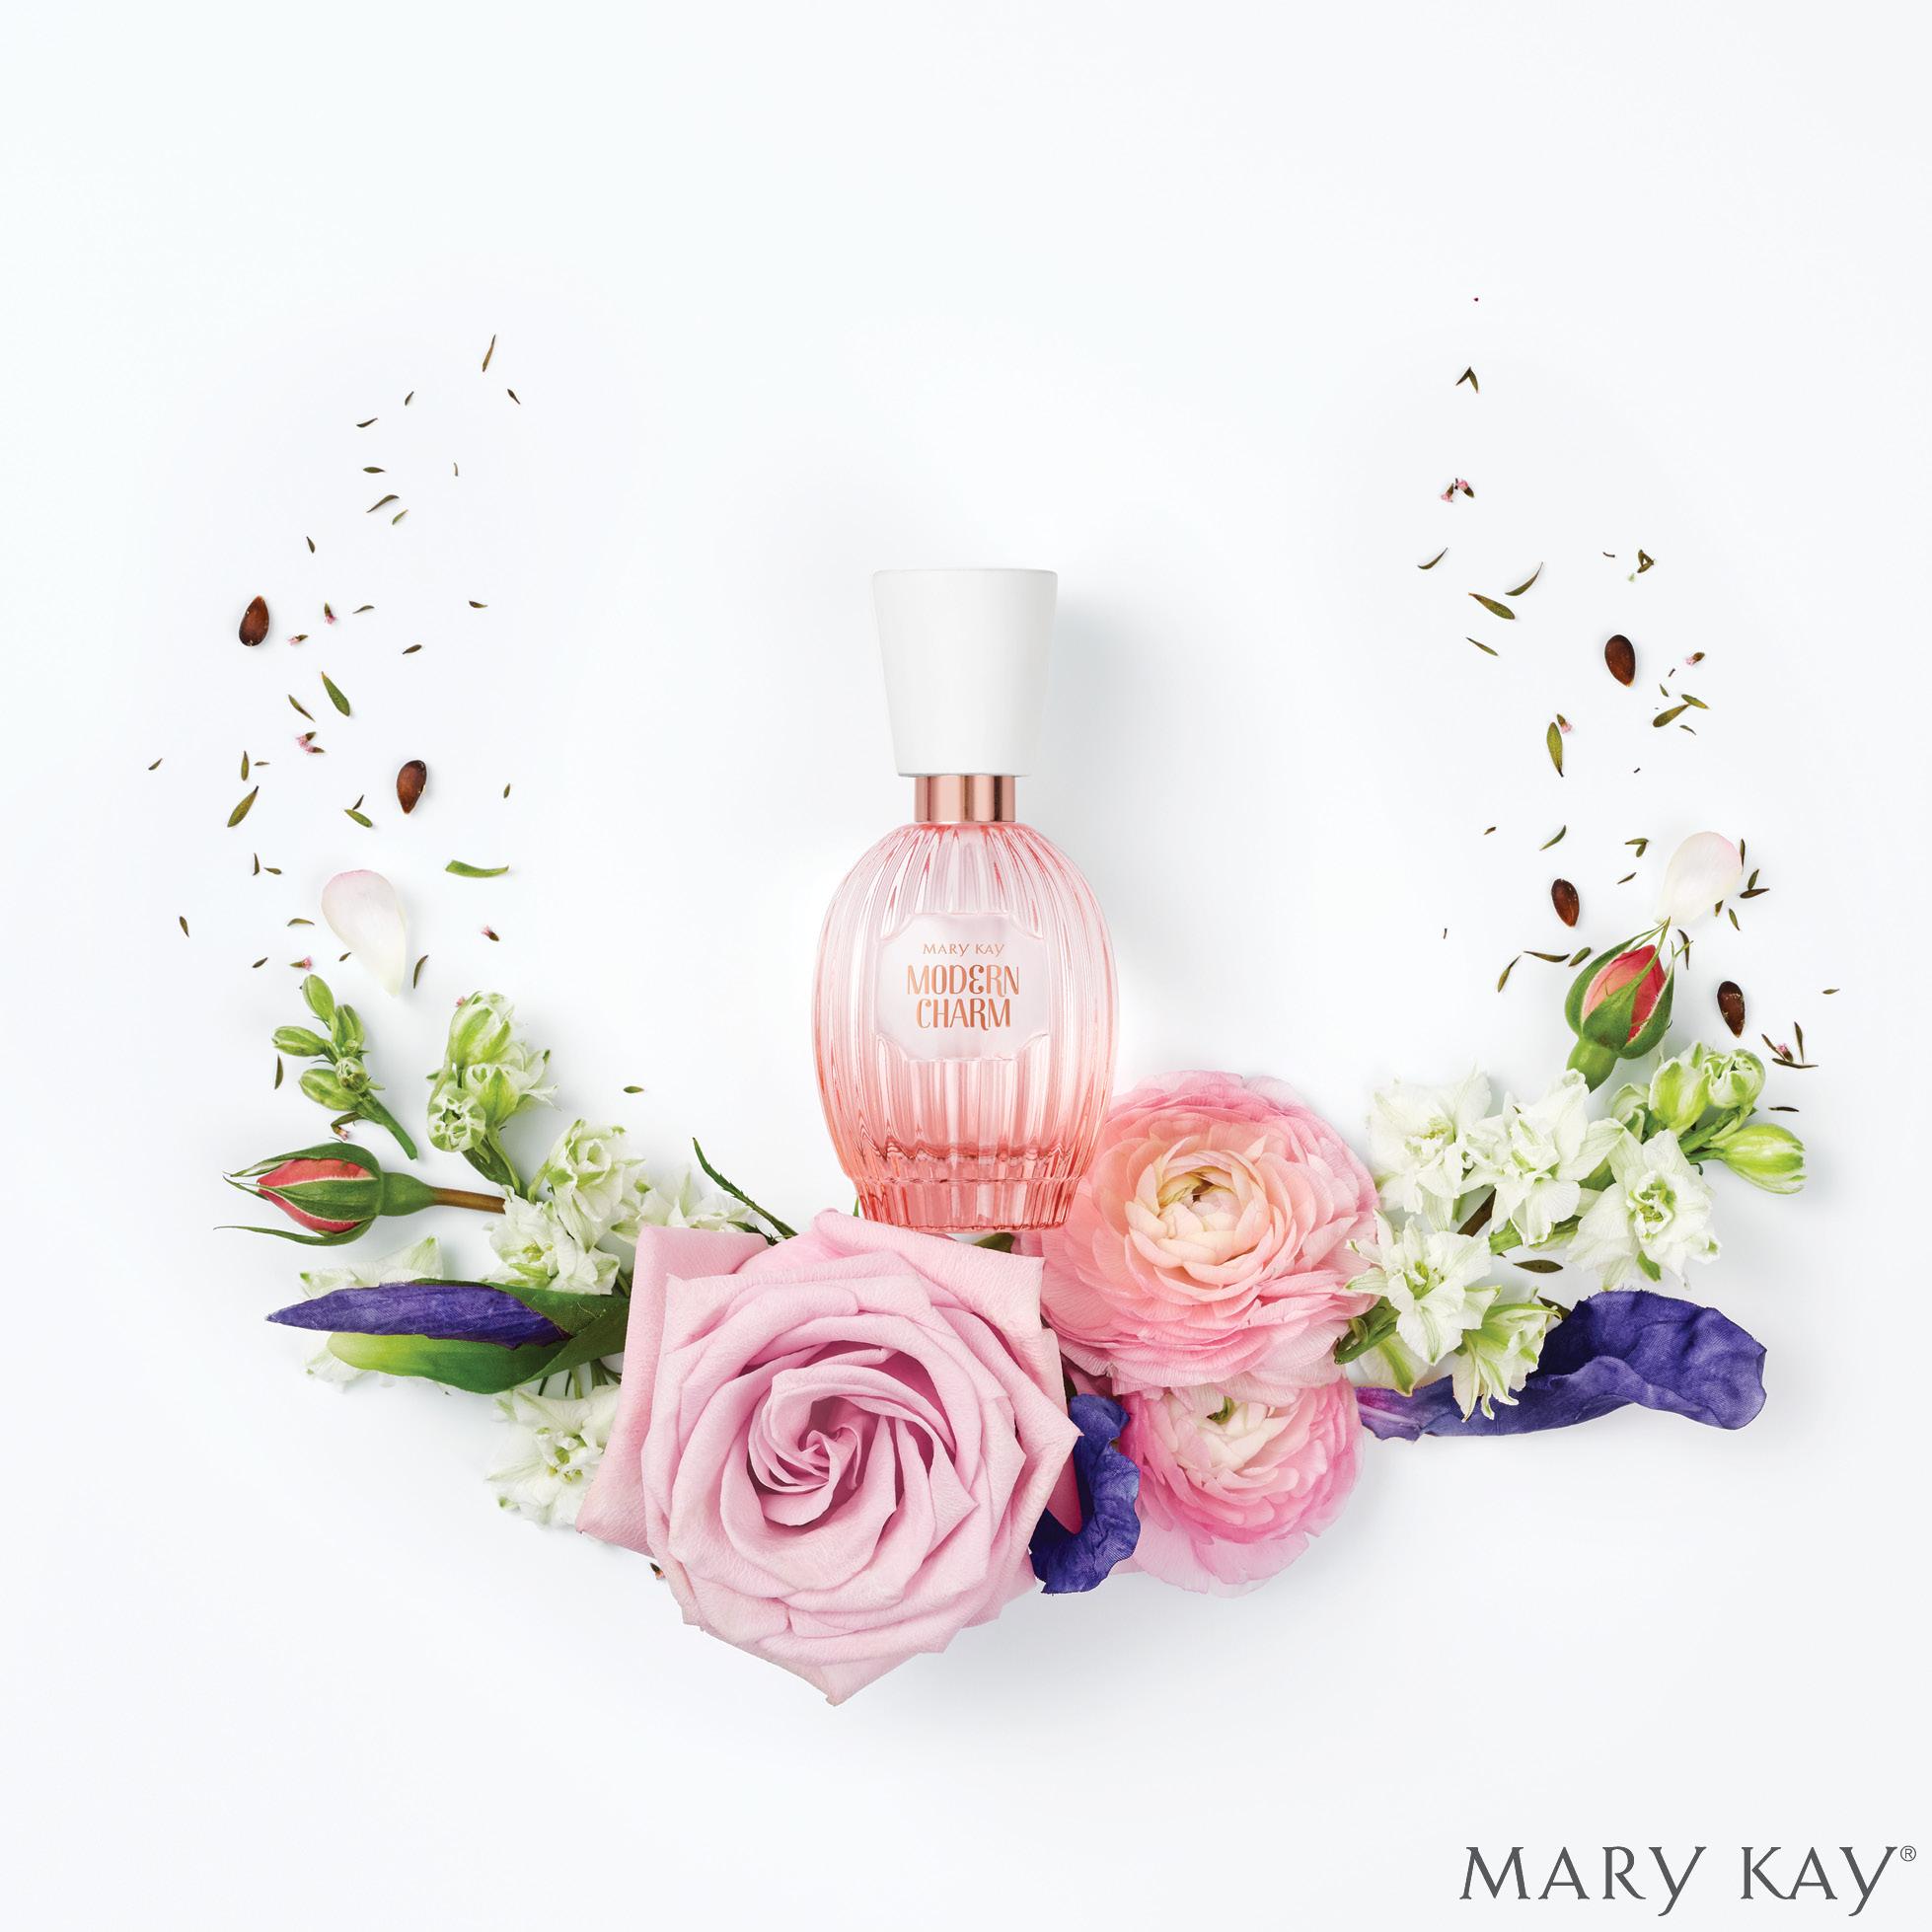 mary-kay-modern-charm-post-launch-gifting-2.jpg